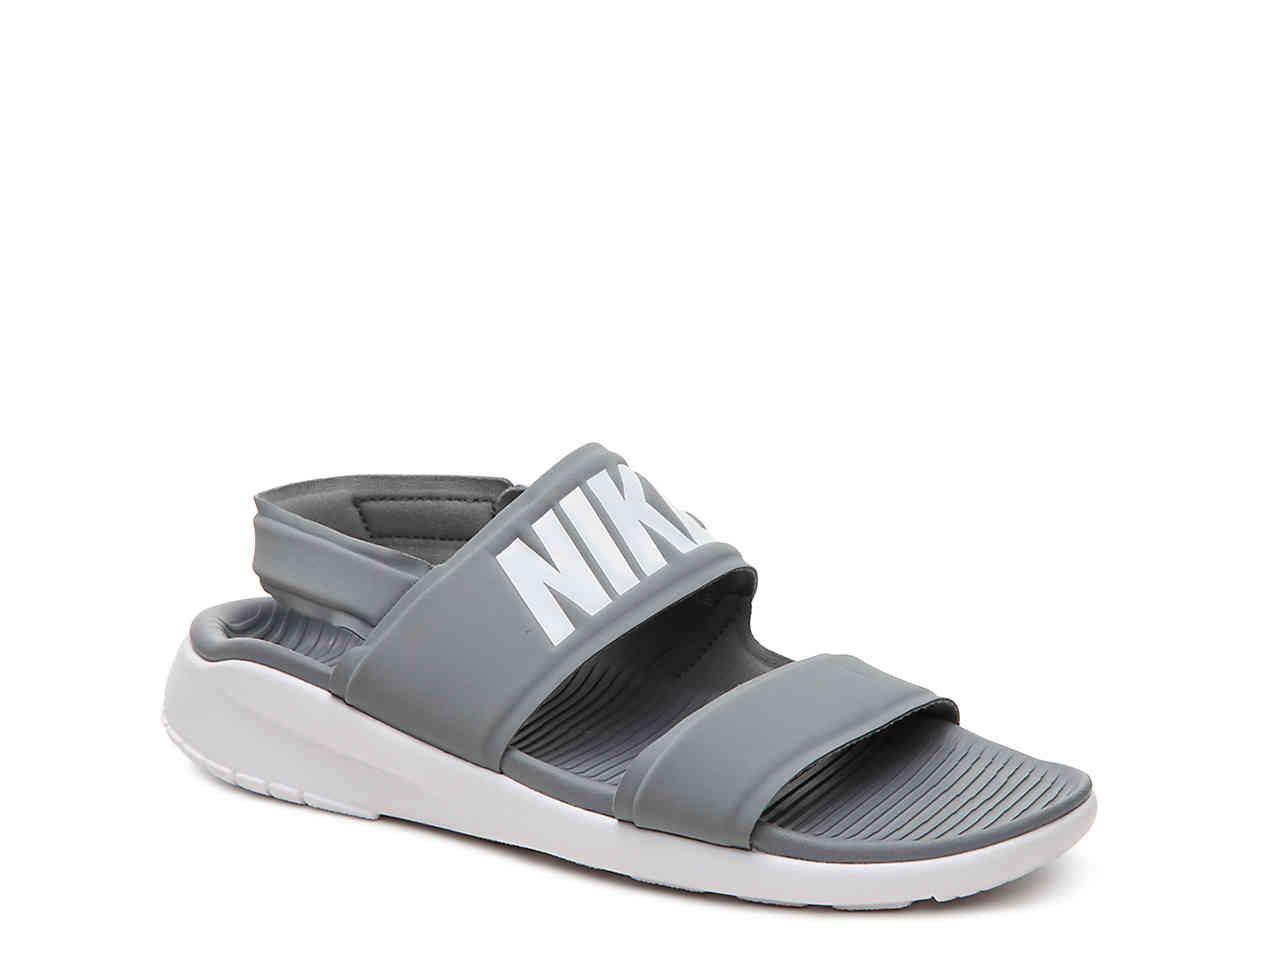 Sandals, Womens sandals, Nike air shoes